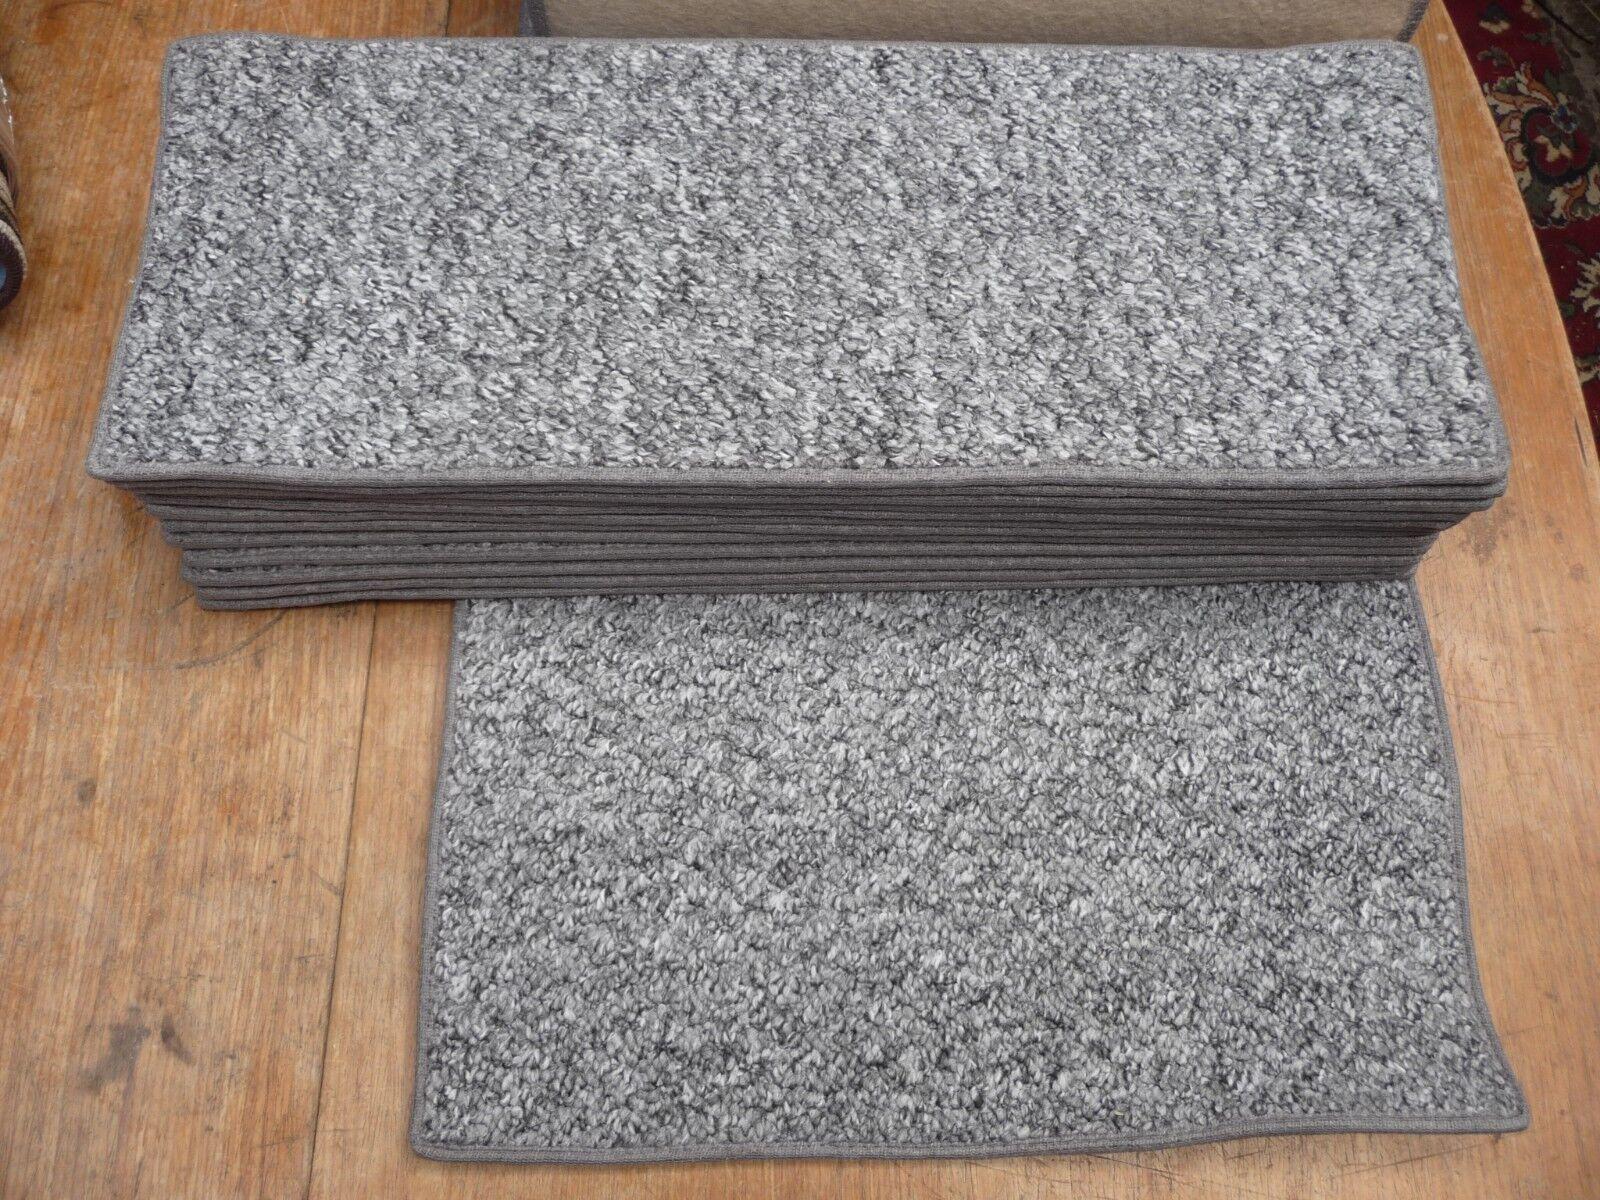 22 x 8.50 pollici (56 x 22 cm) resistente grigio scala PADS  2012